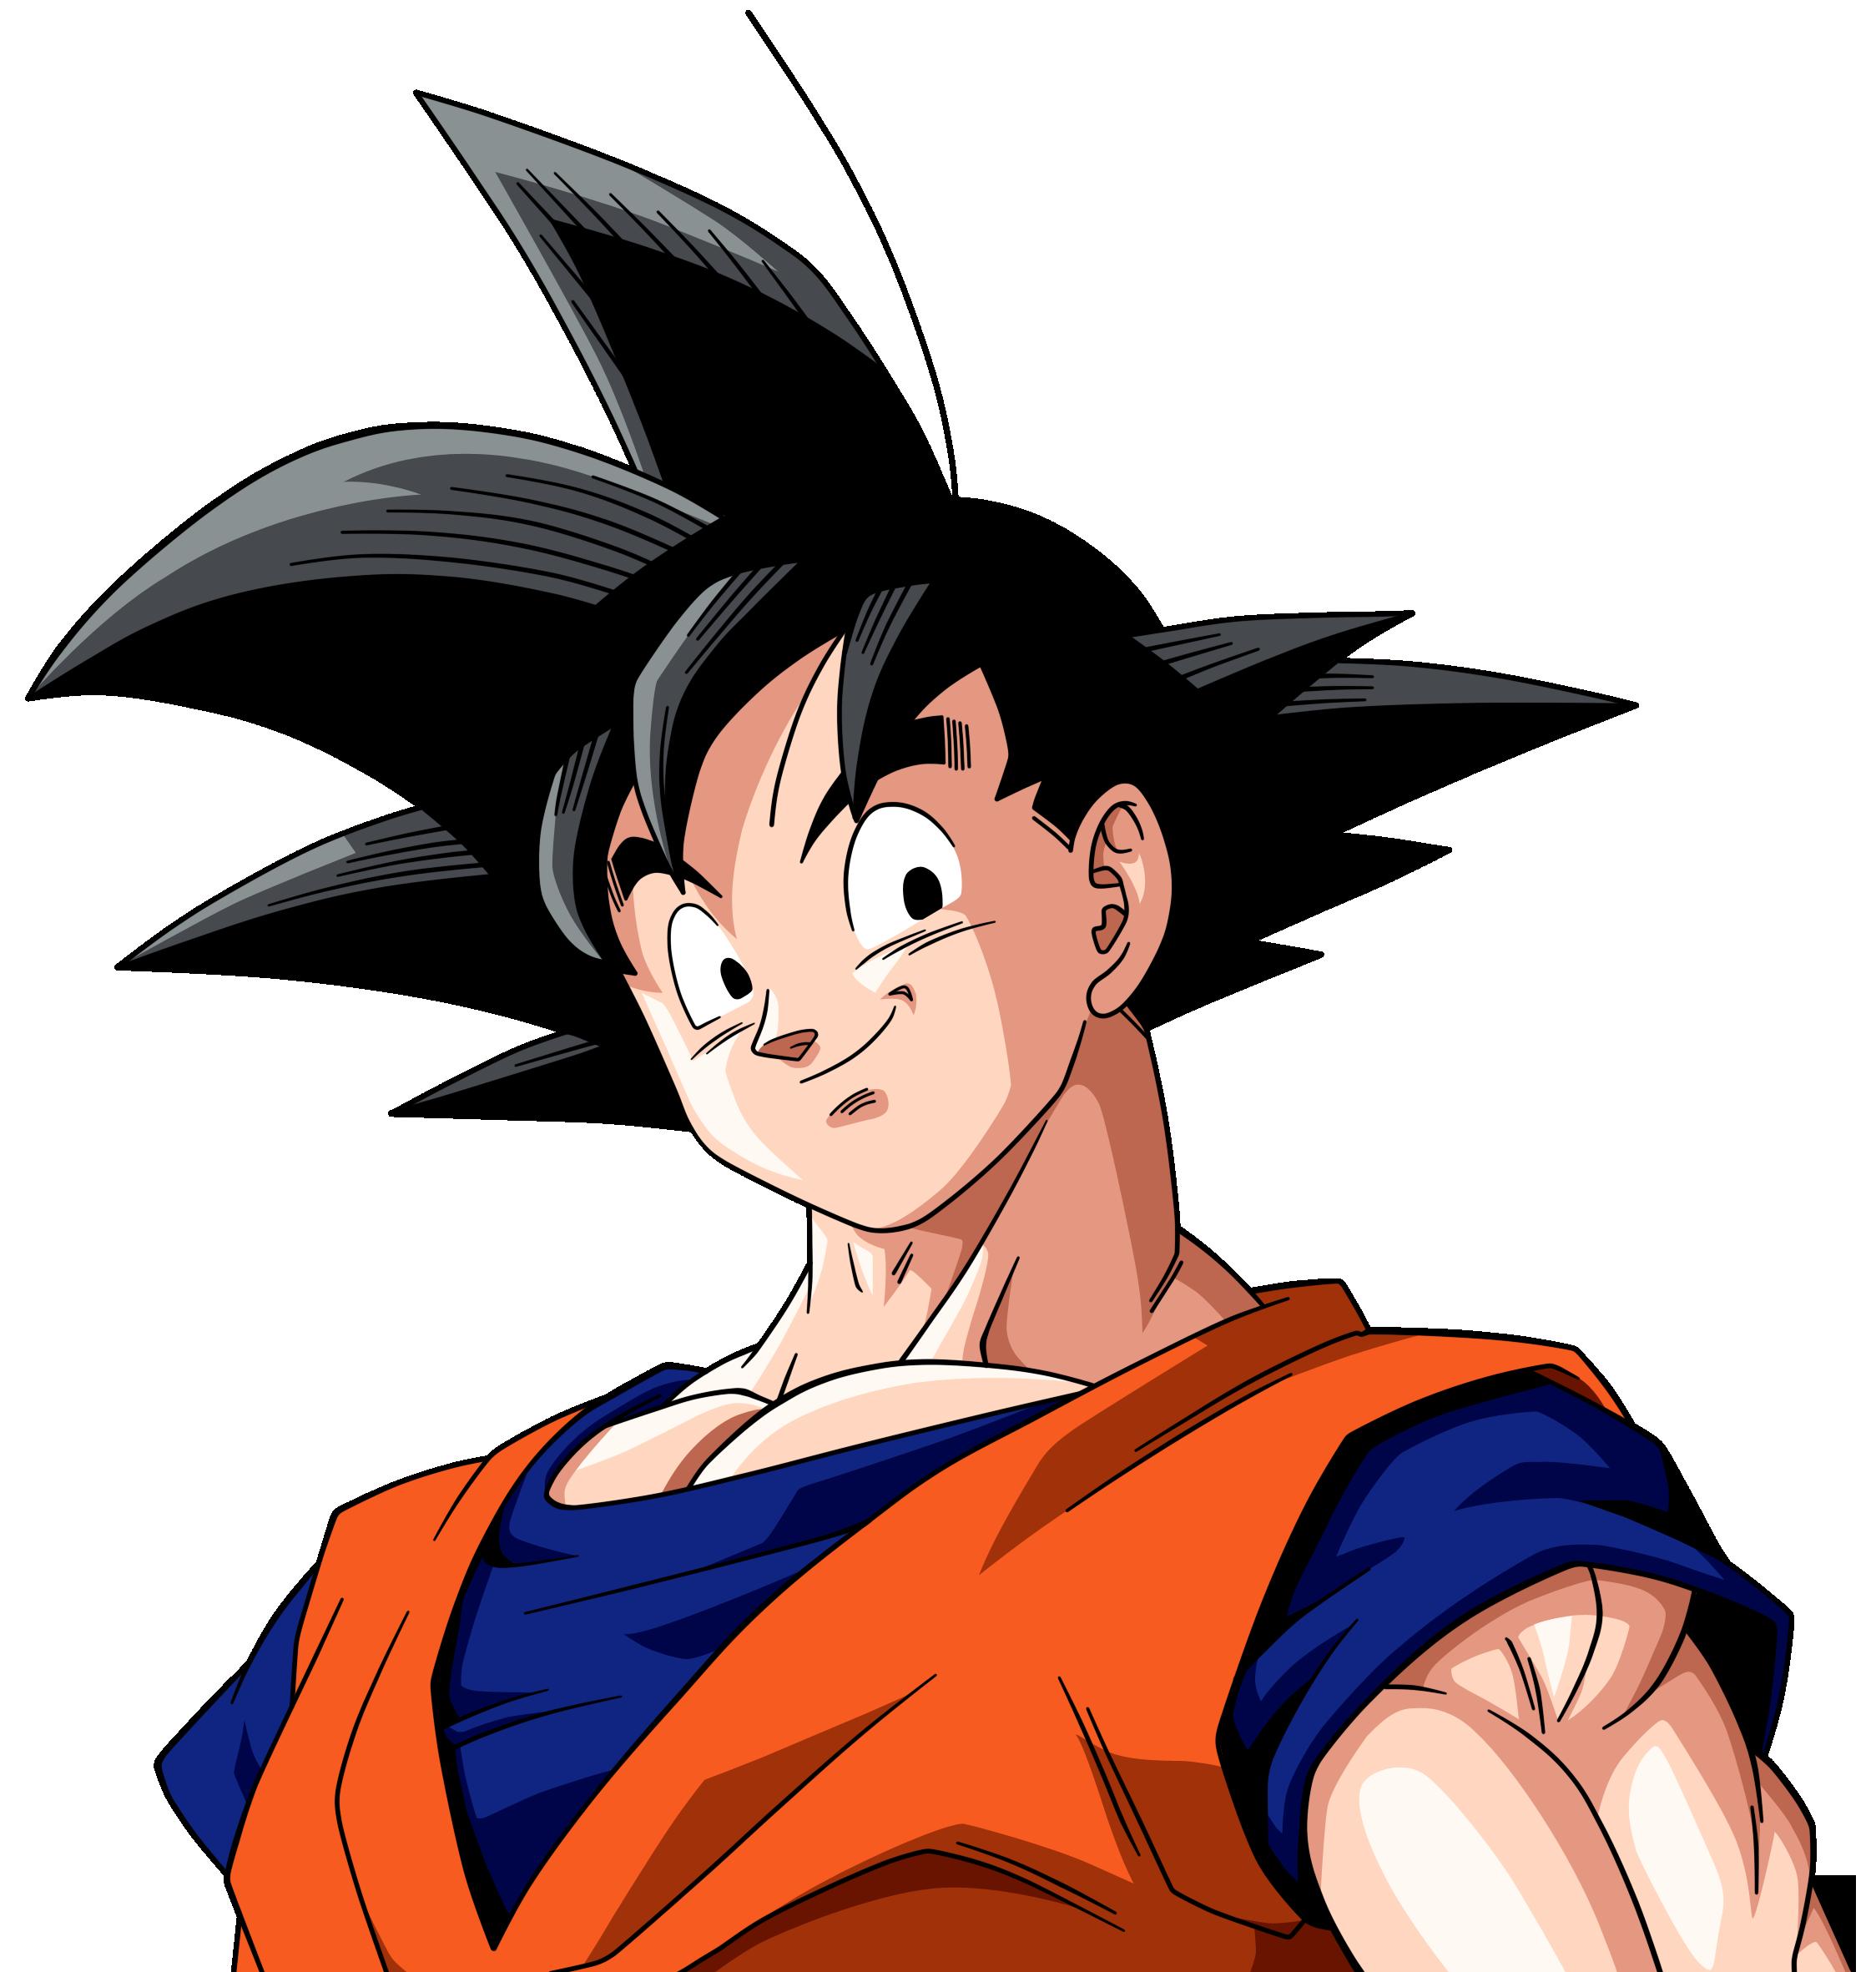 Gokunormal